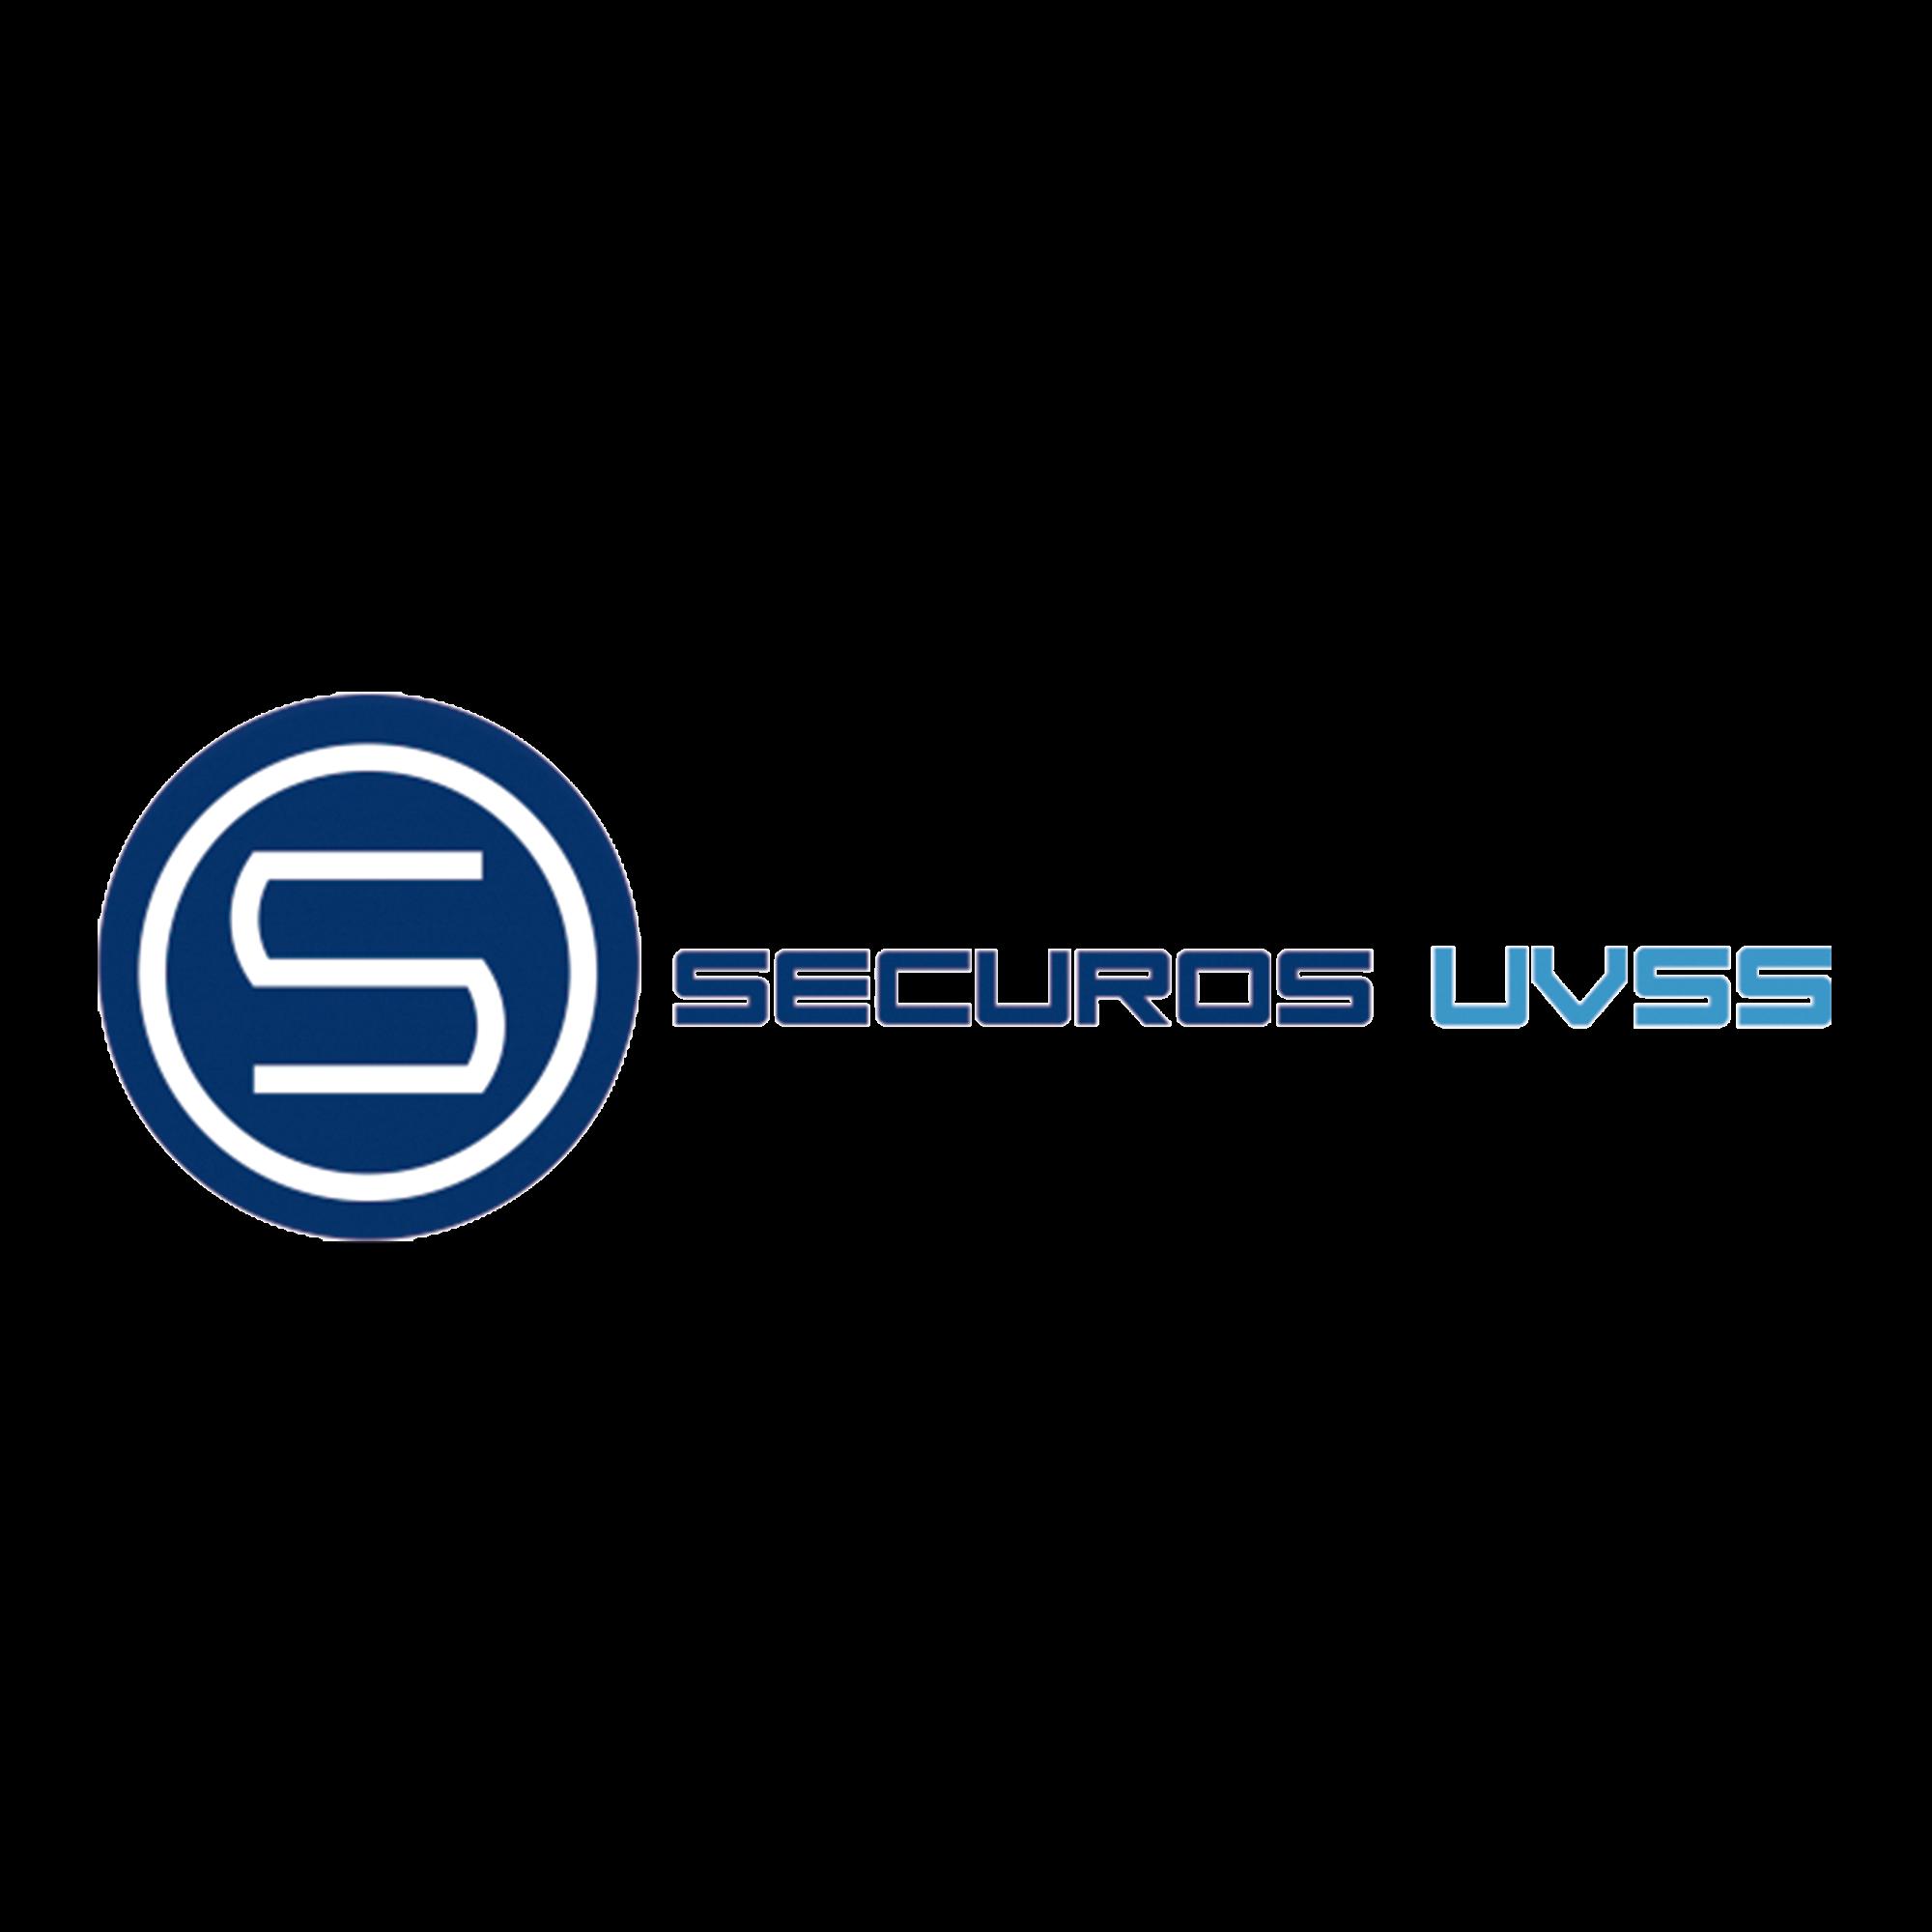 CONTROLADOR SECUROS UVSS (SERVER) PROCES I7 GPU NVIDIA ADMINISTRA 1 PLATAFORMA DE ESCANEO UVSS Y 2 CANALES LPR (BAJA VELOCIDAD)